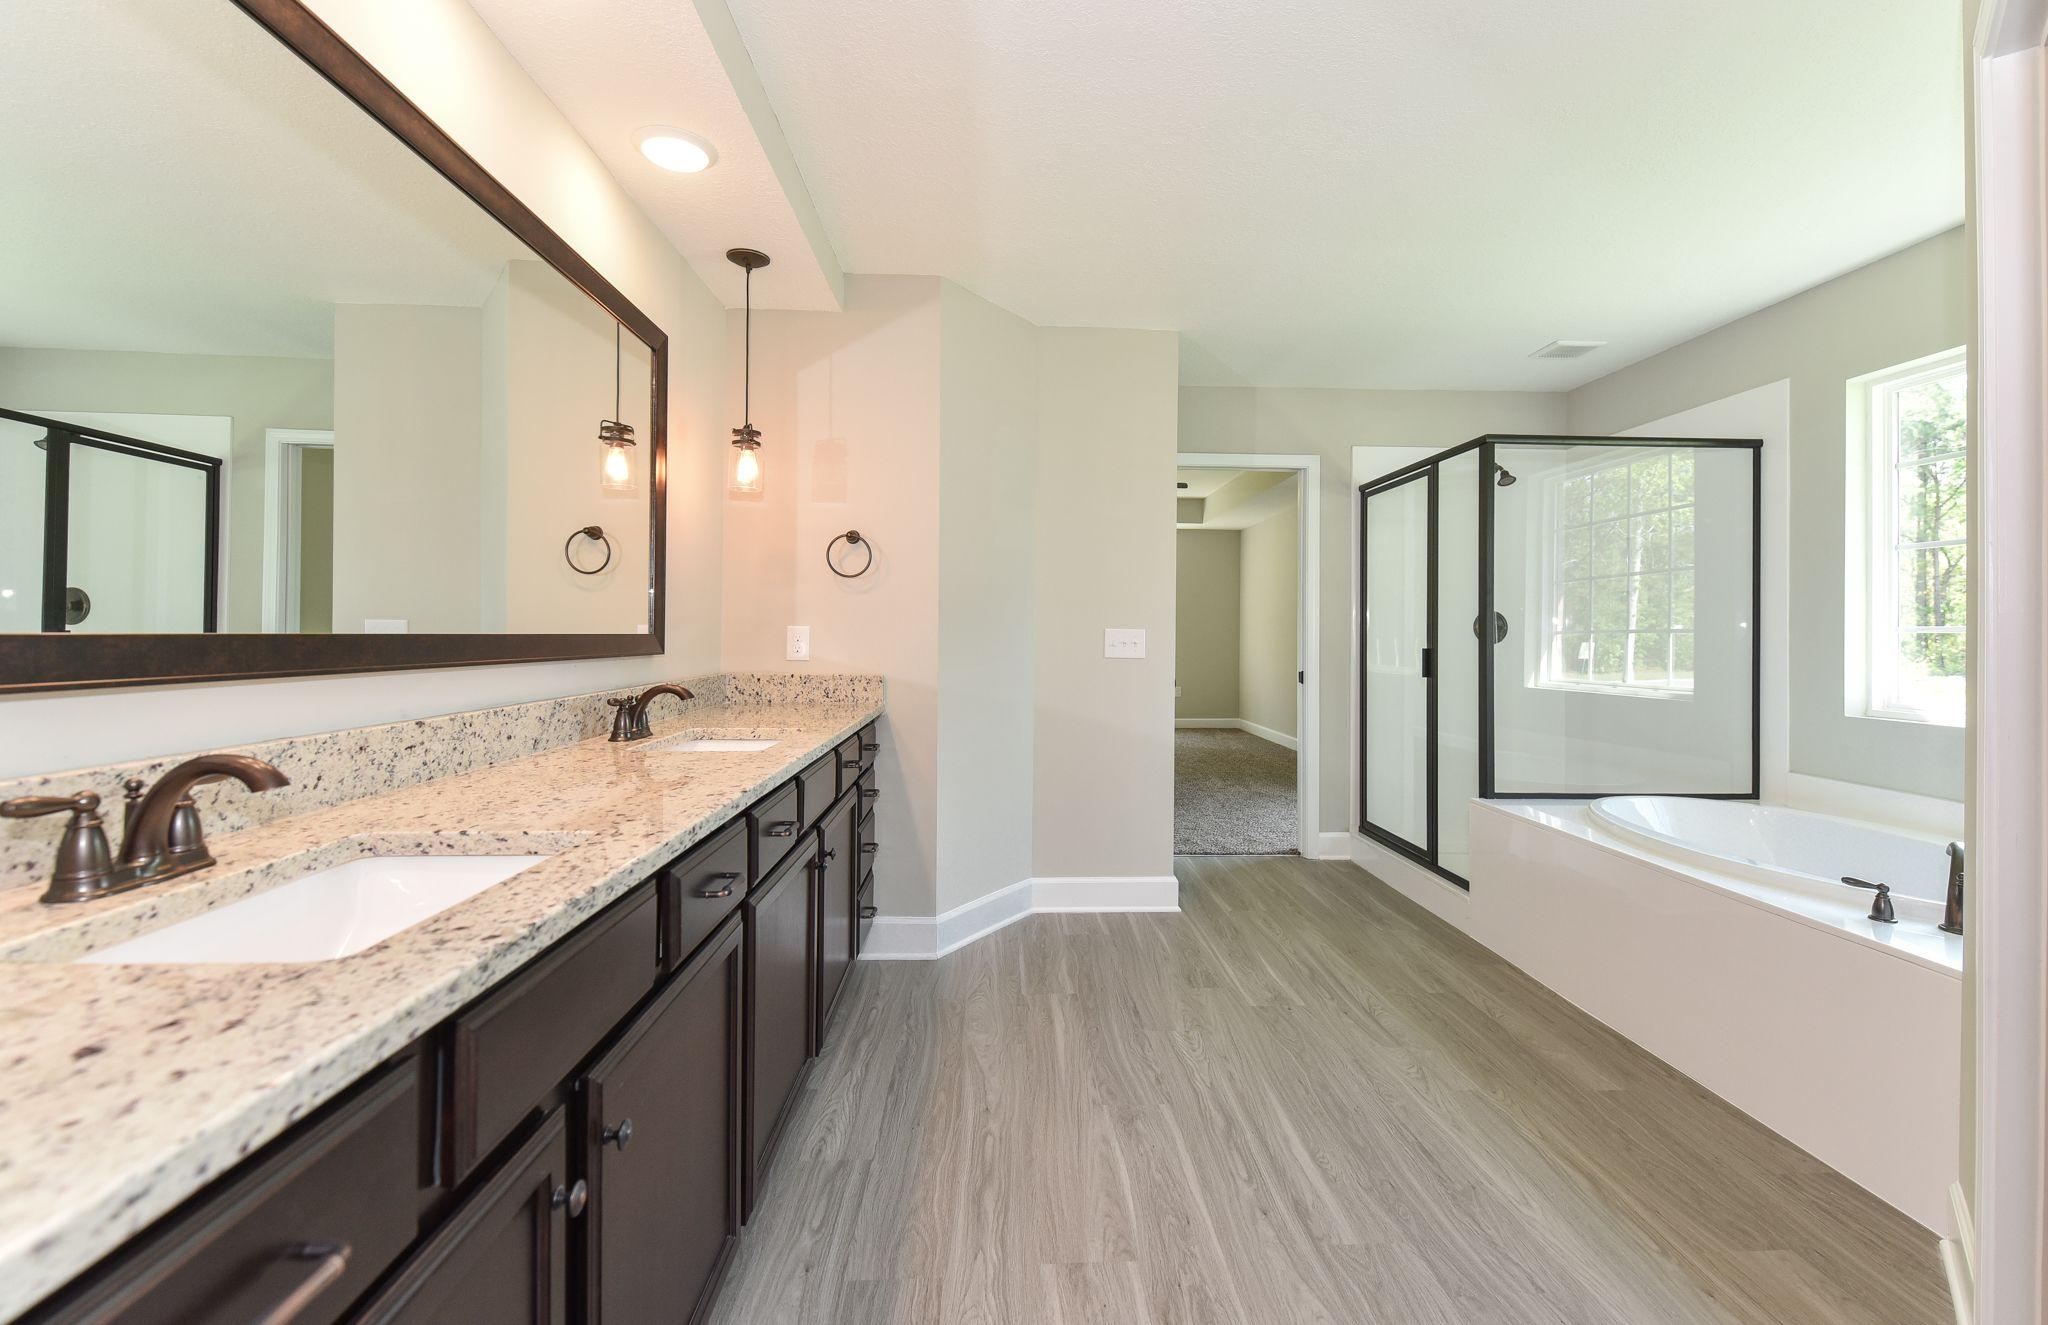 Bathroom featured in the Wakefield By Ernest Homes in Savannah, GA